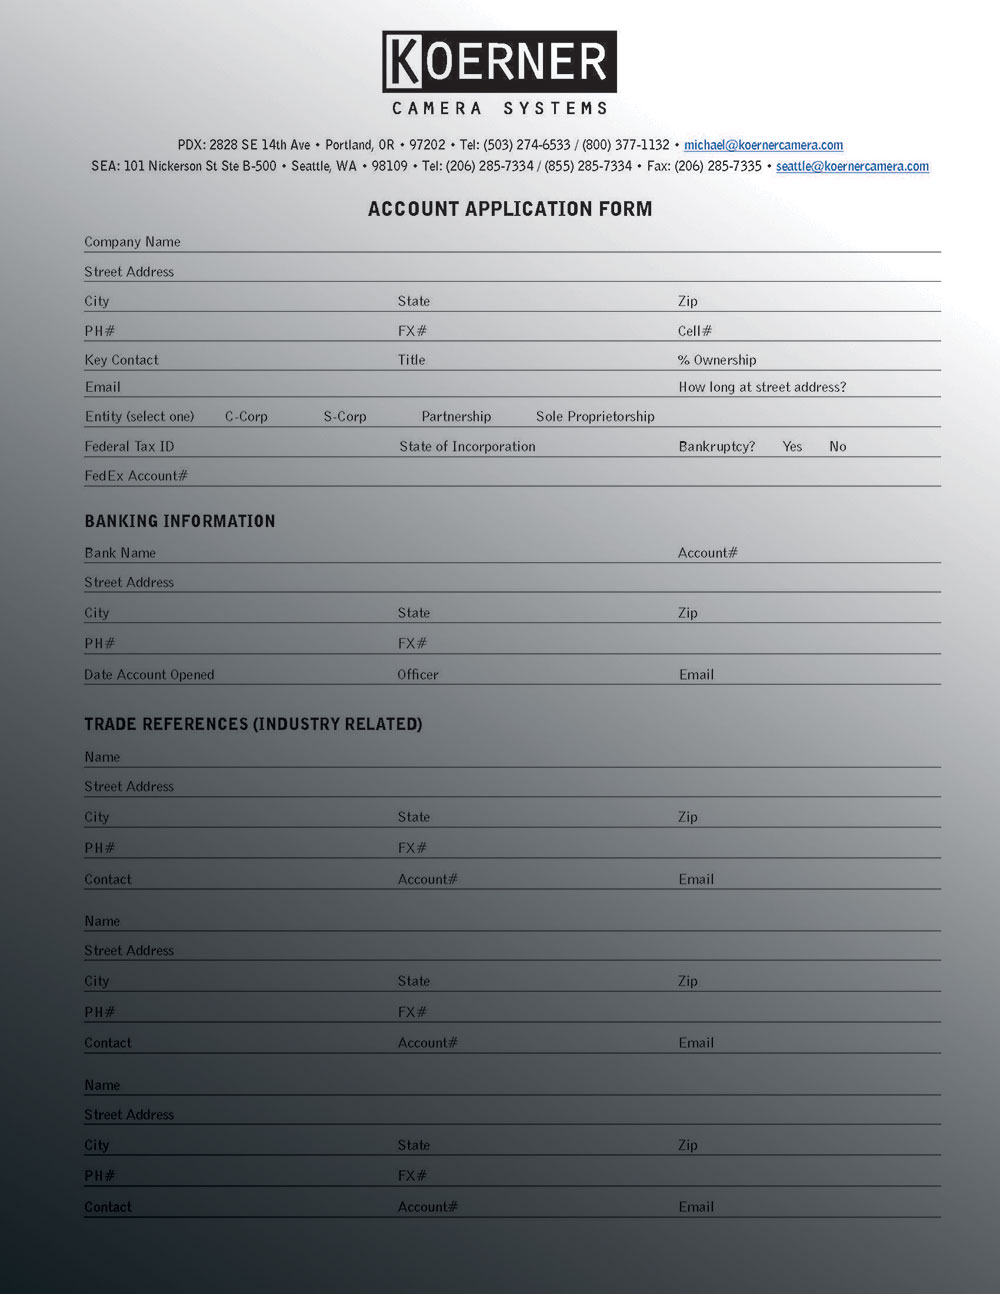 KCS NEW CLIENT ACCOUNT APPLICATION